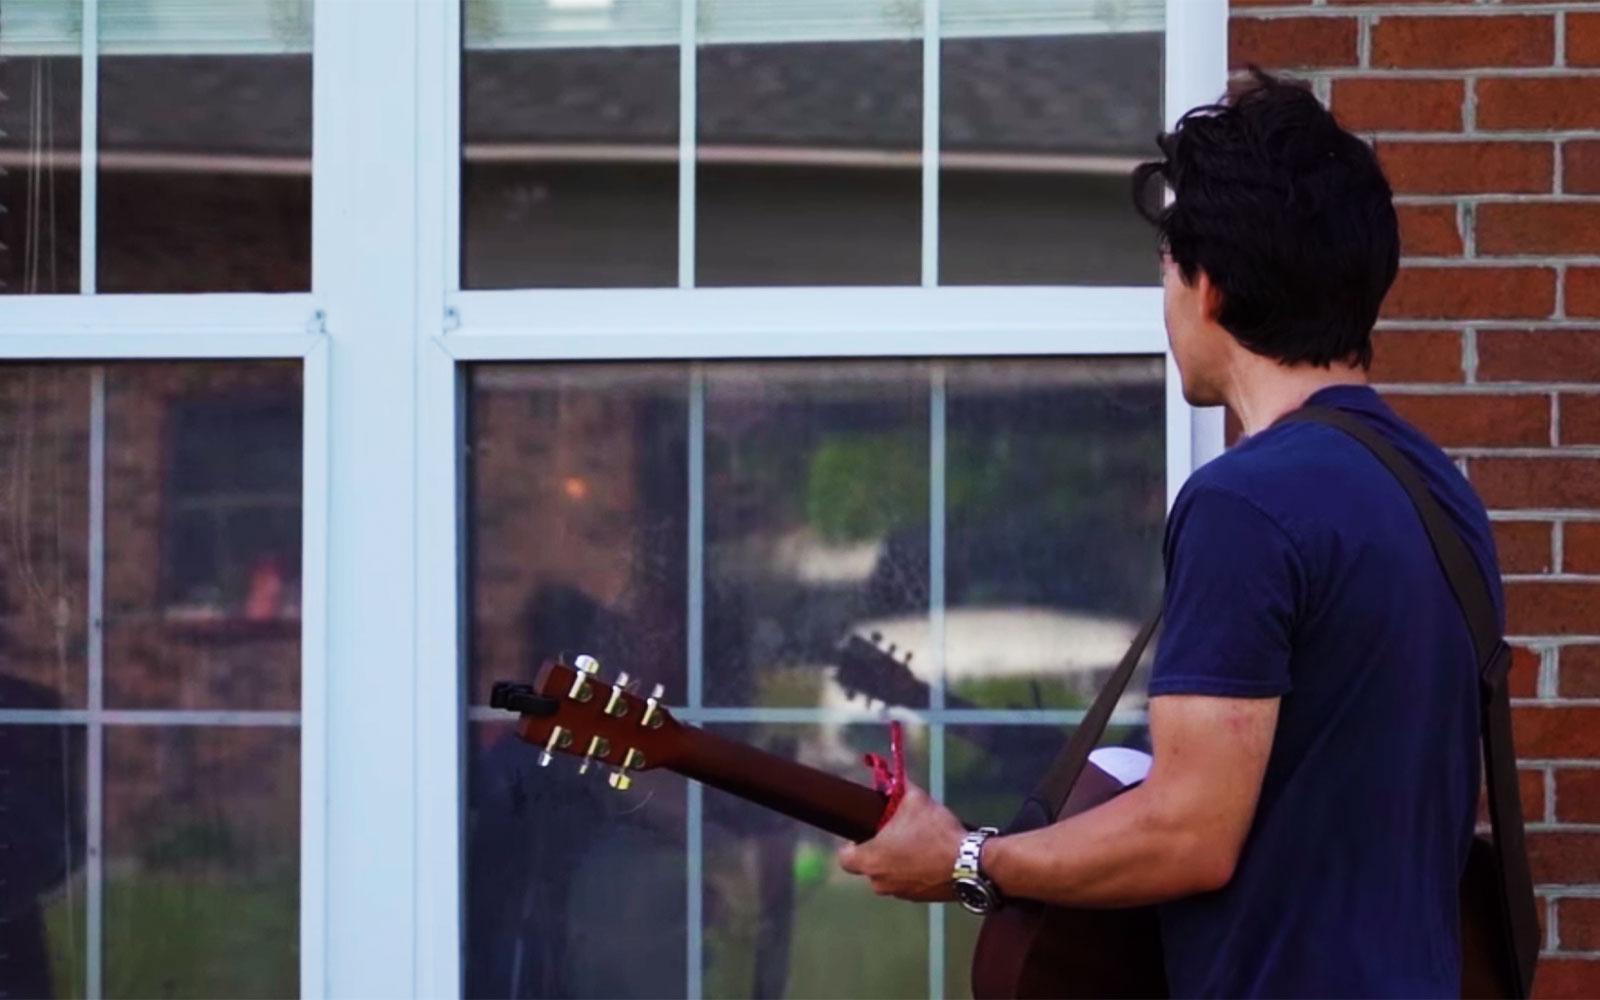 Spreading Joy Through Music – And Windows!